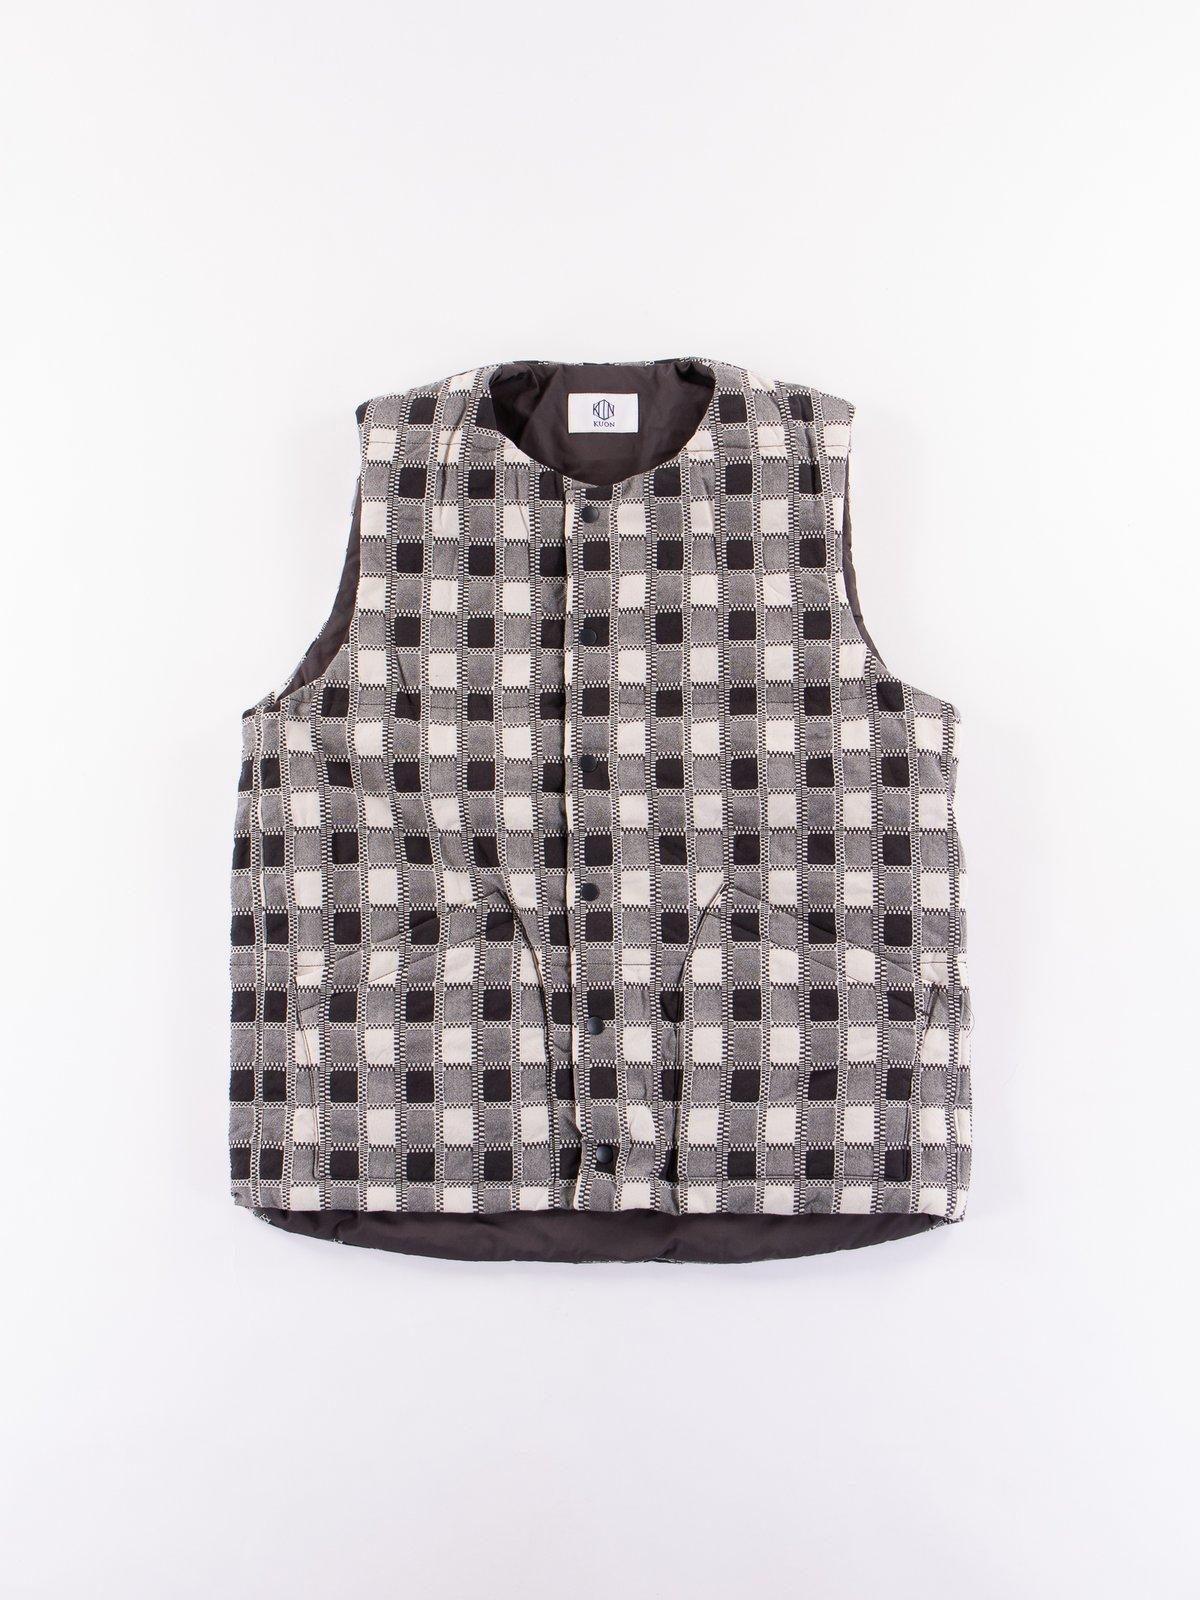 Miwa Yoshino Plaid Vest - Image 1